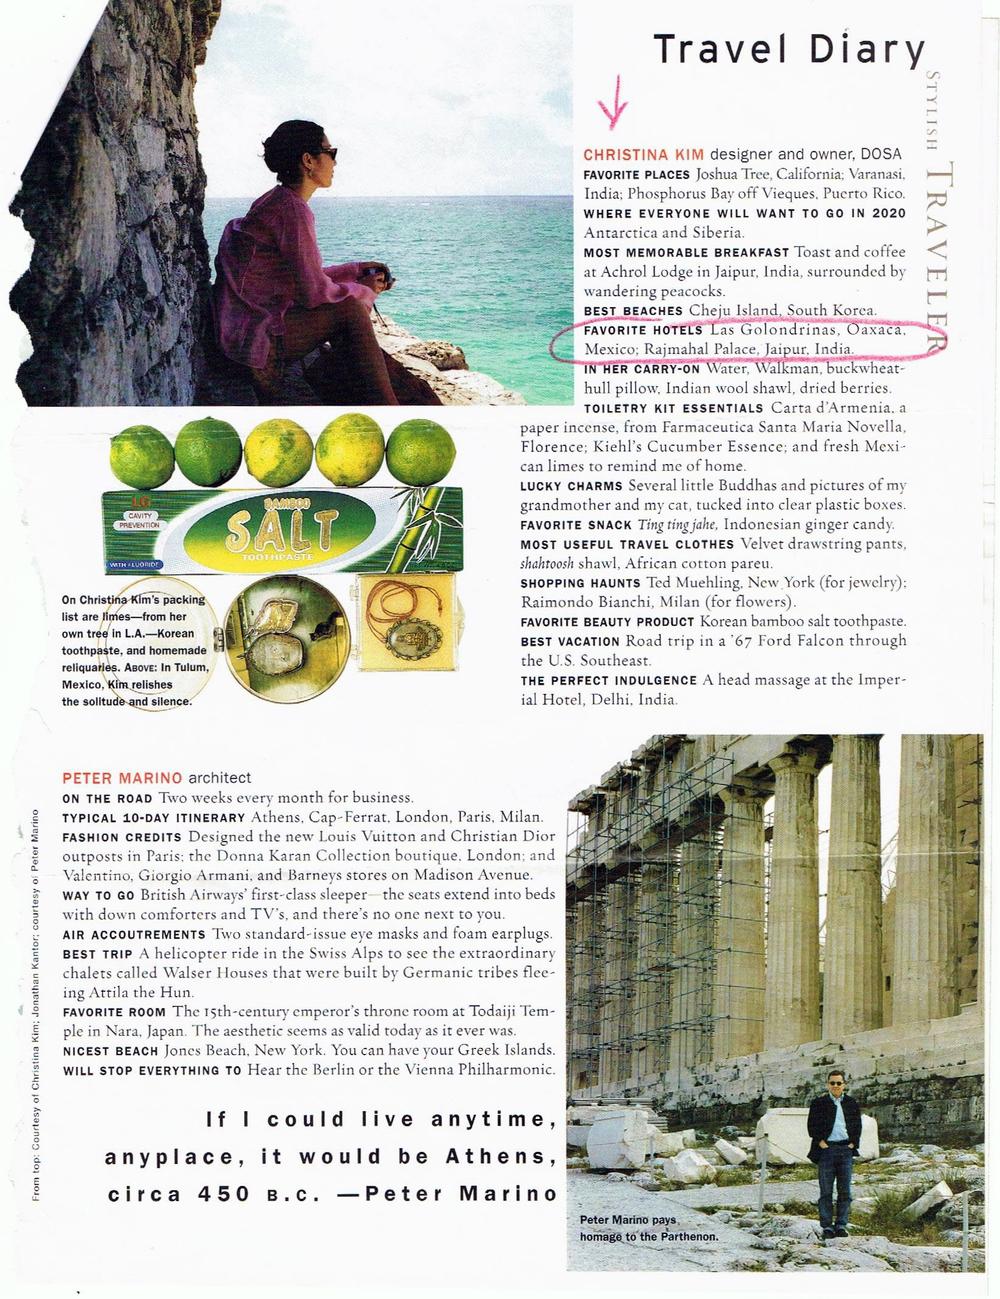 Travel & Leisure, Travel diary, Christina Kim.